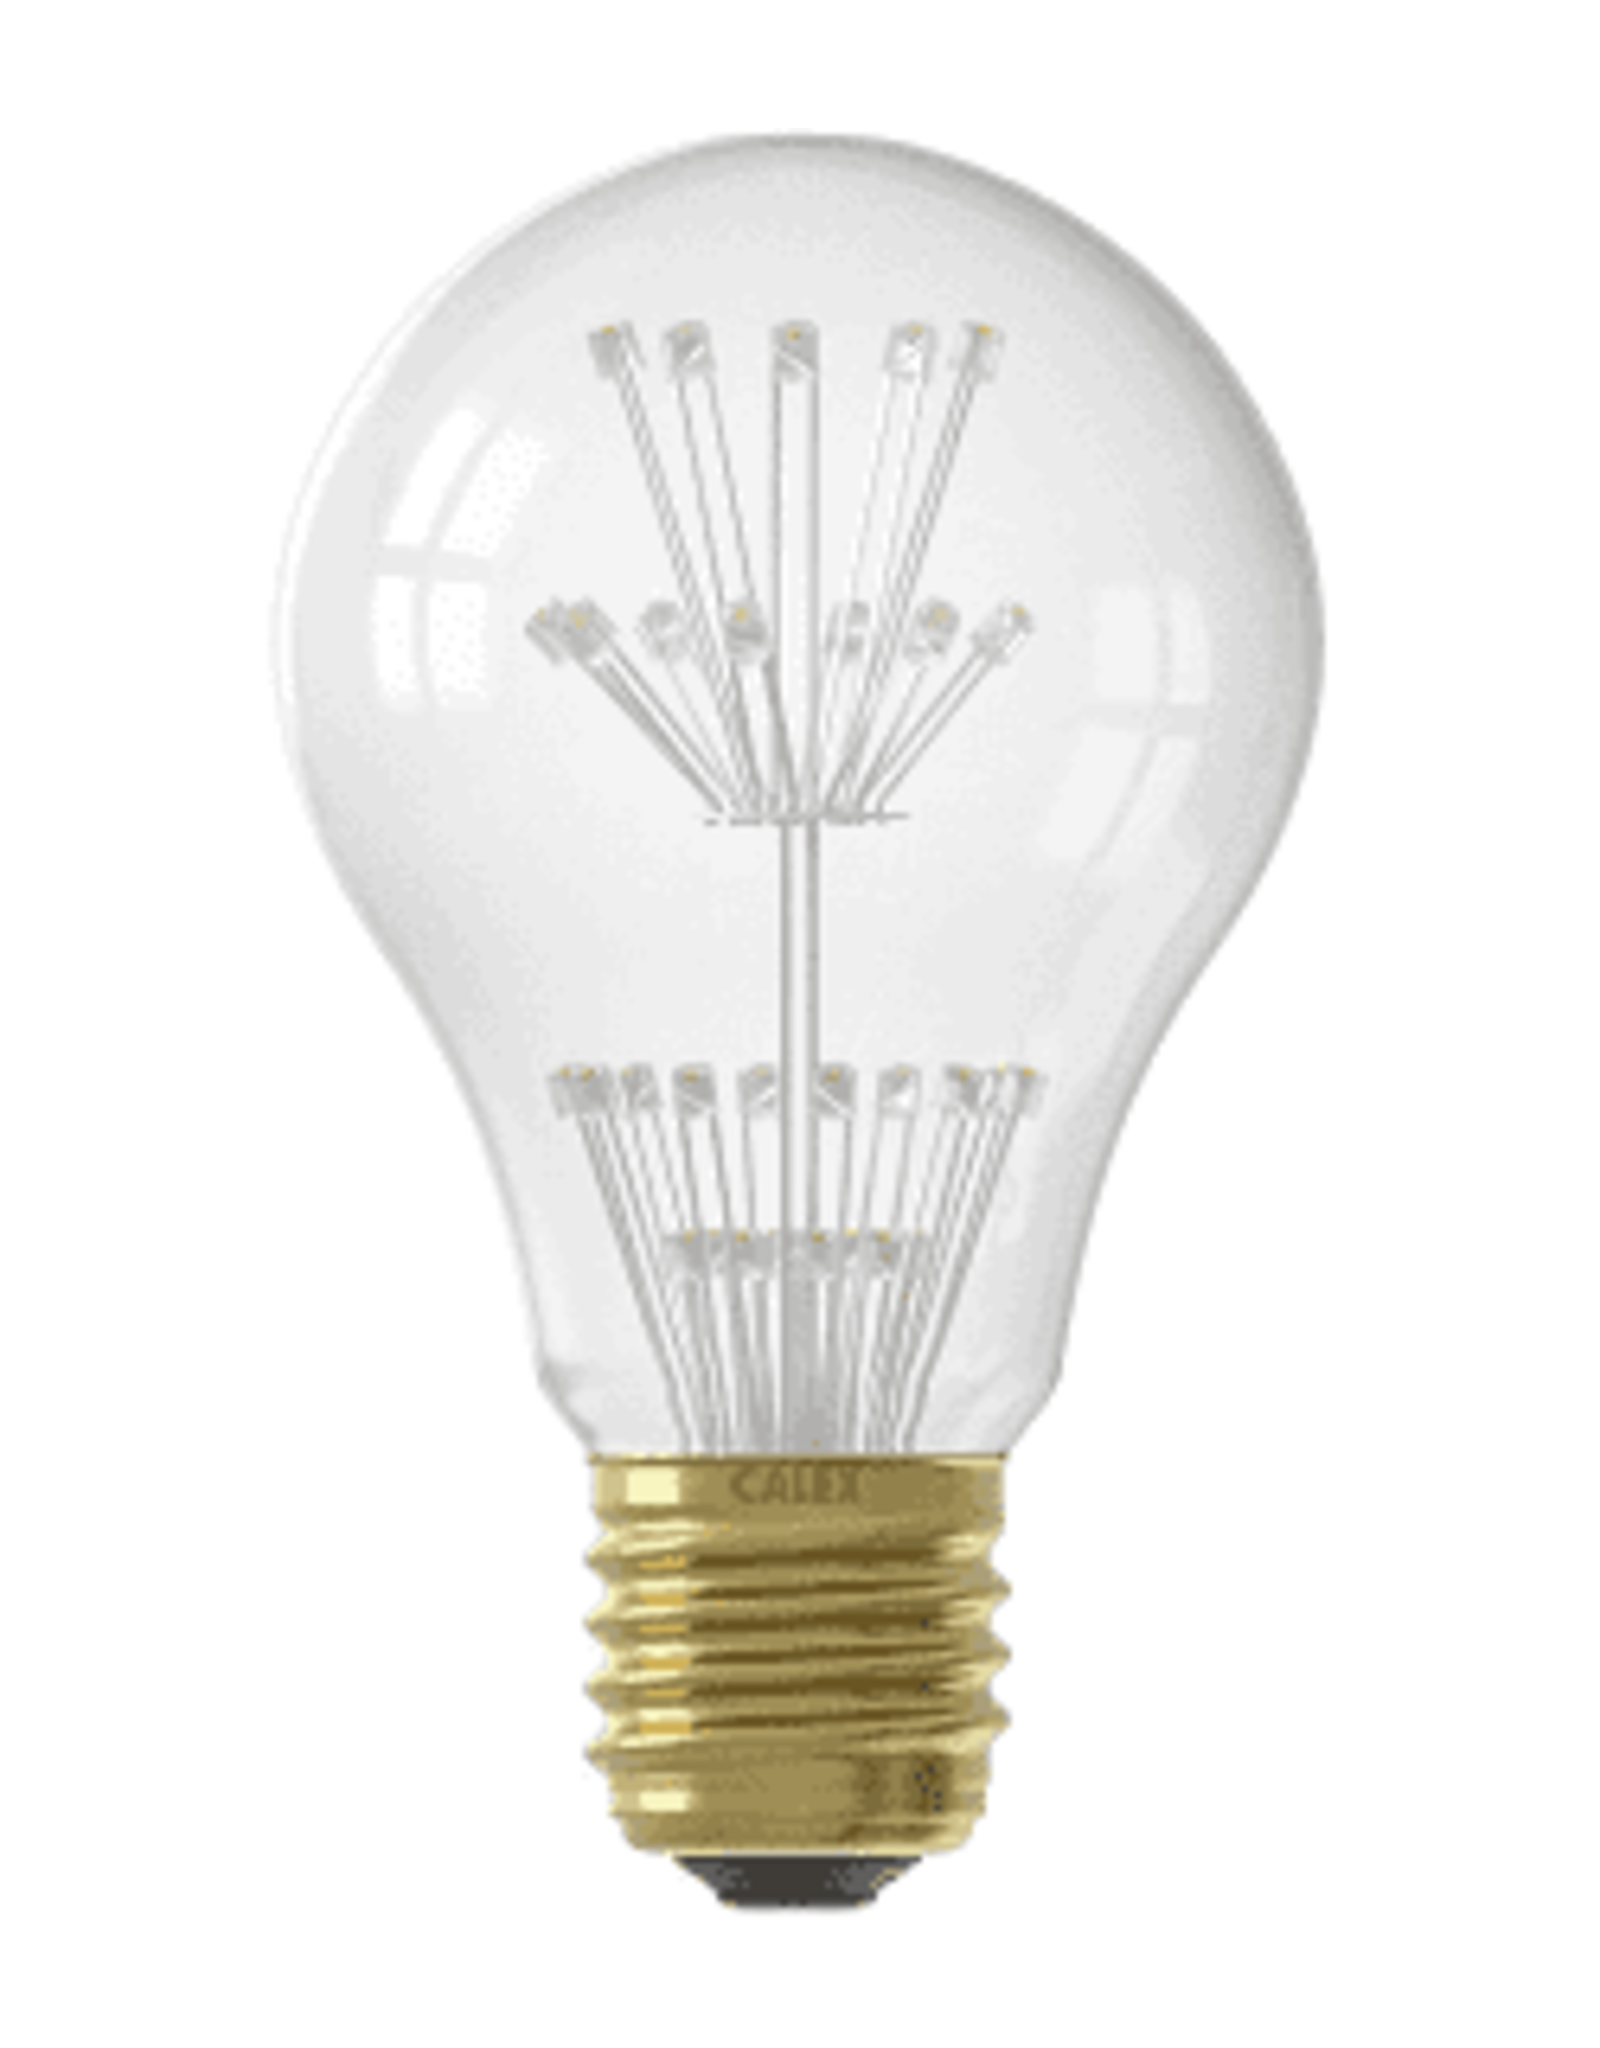 Calex Pearl LED GLS-lamp 220-240V 1,5W E27 A60, 30-leds 2100K, energy label A++